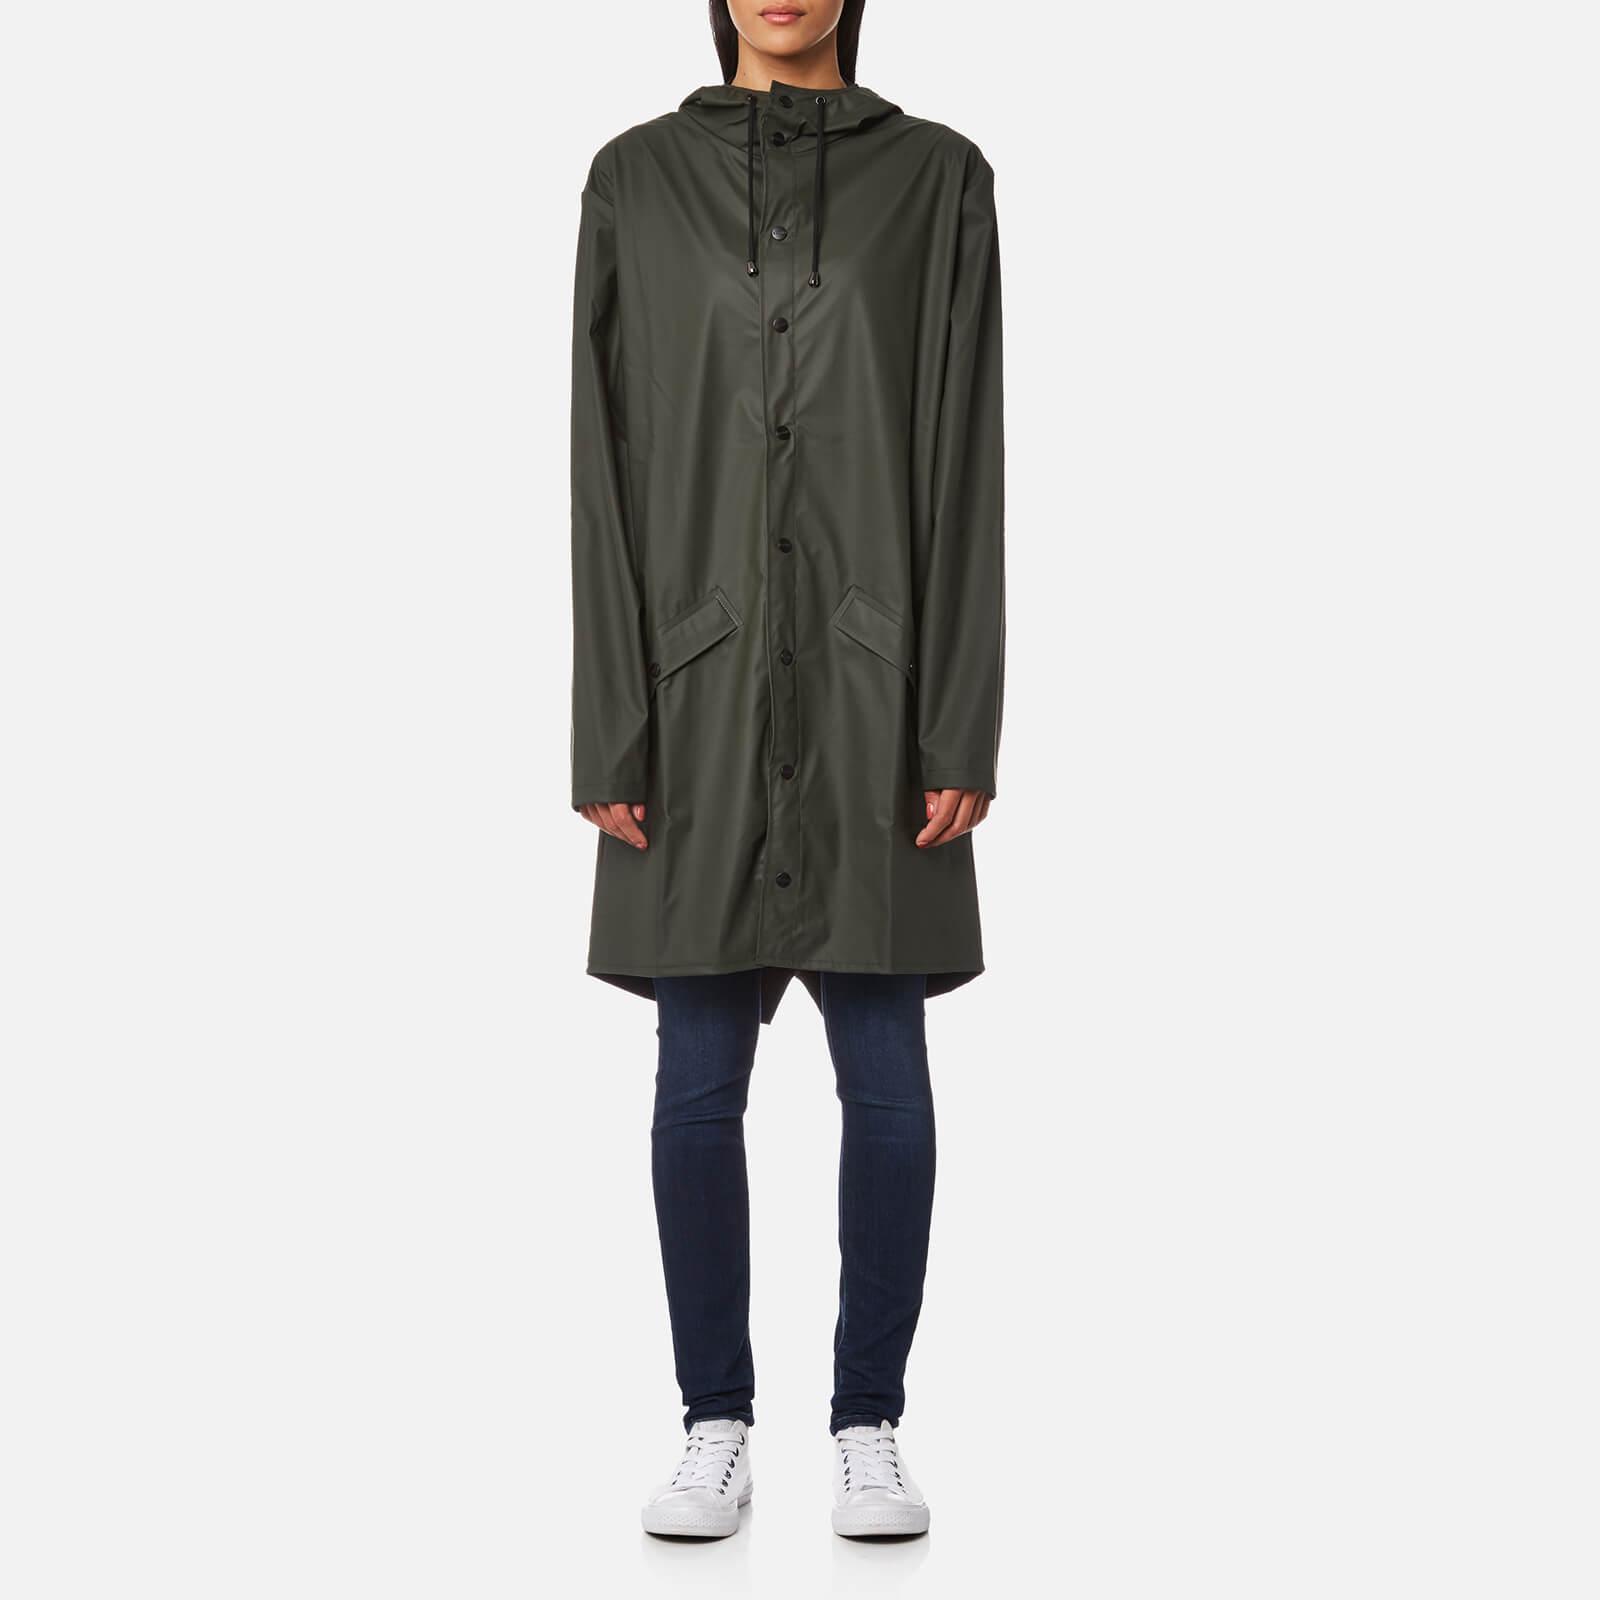 RAINS Women's Long Jacket - Green - M-L